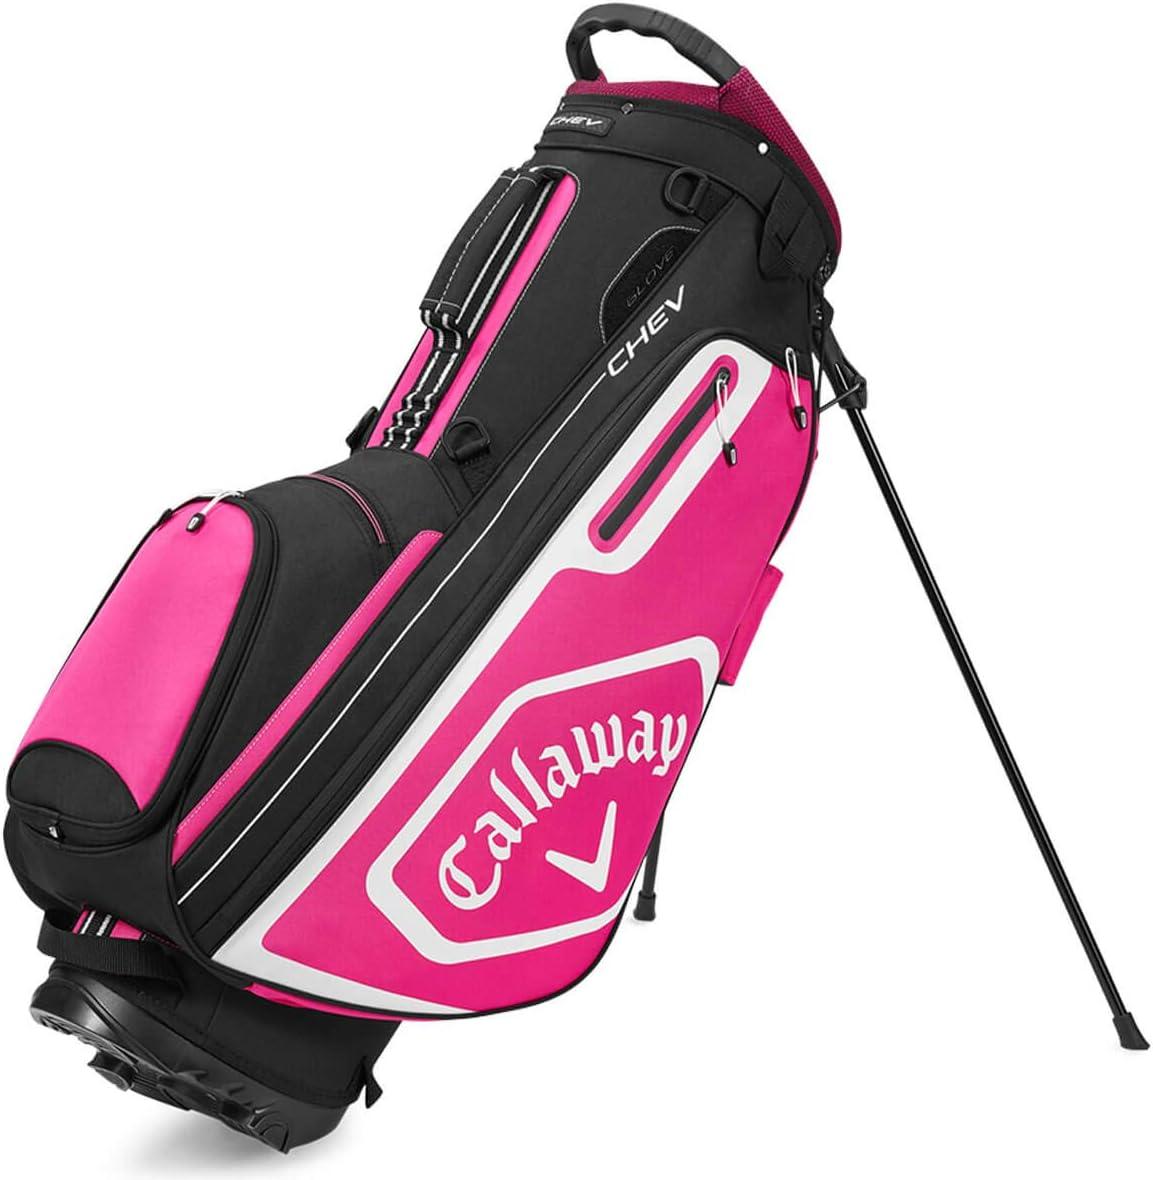 Callaway Golf Chev Stand Bag 2020